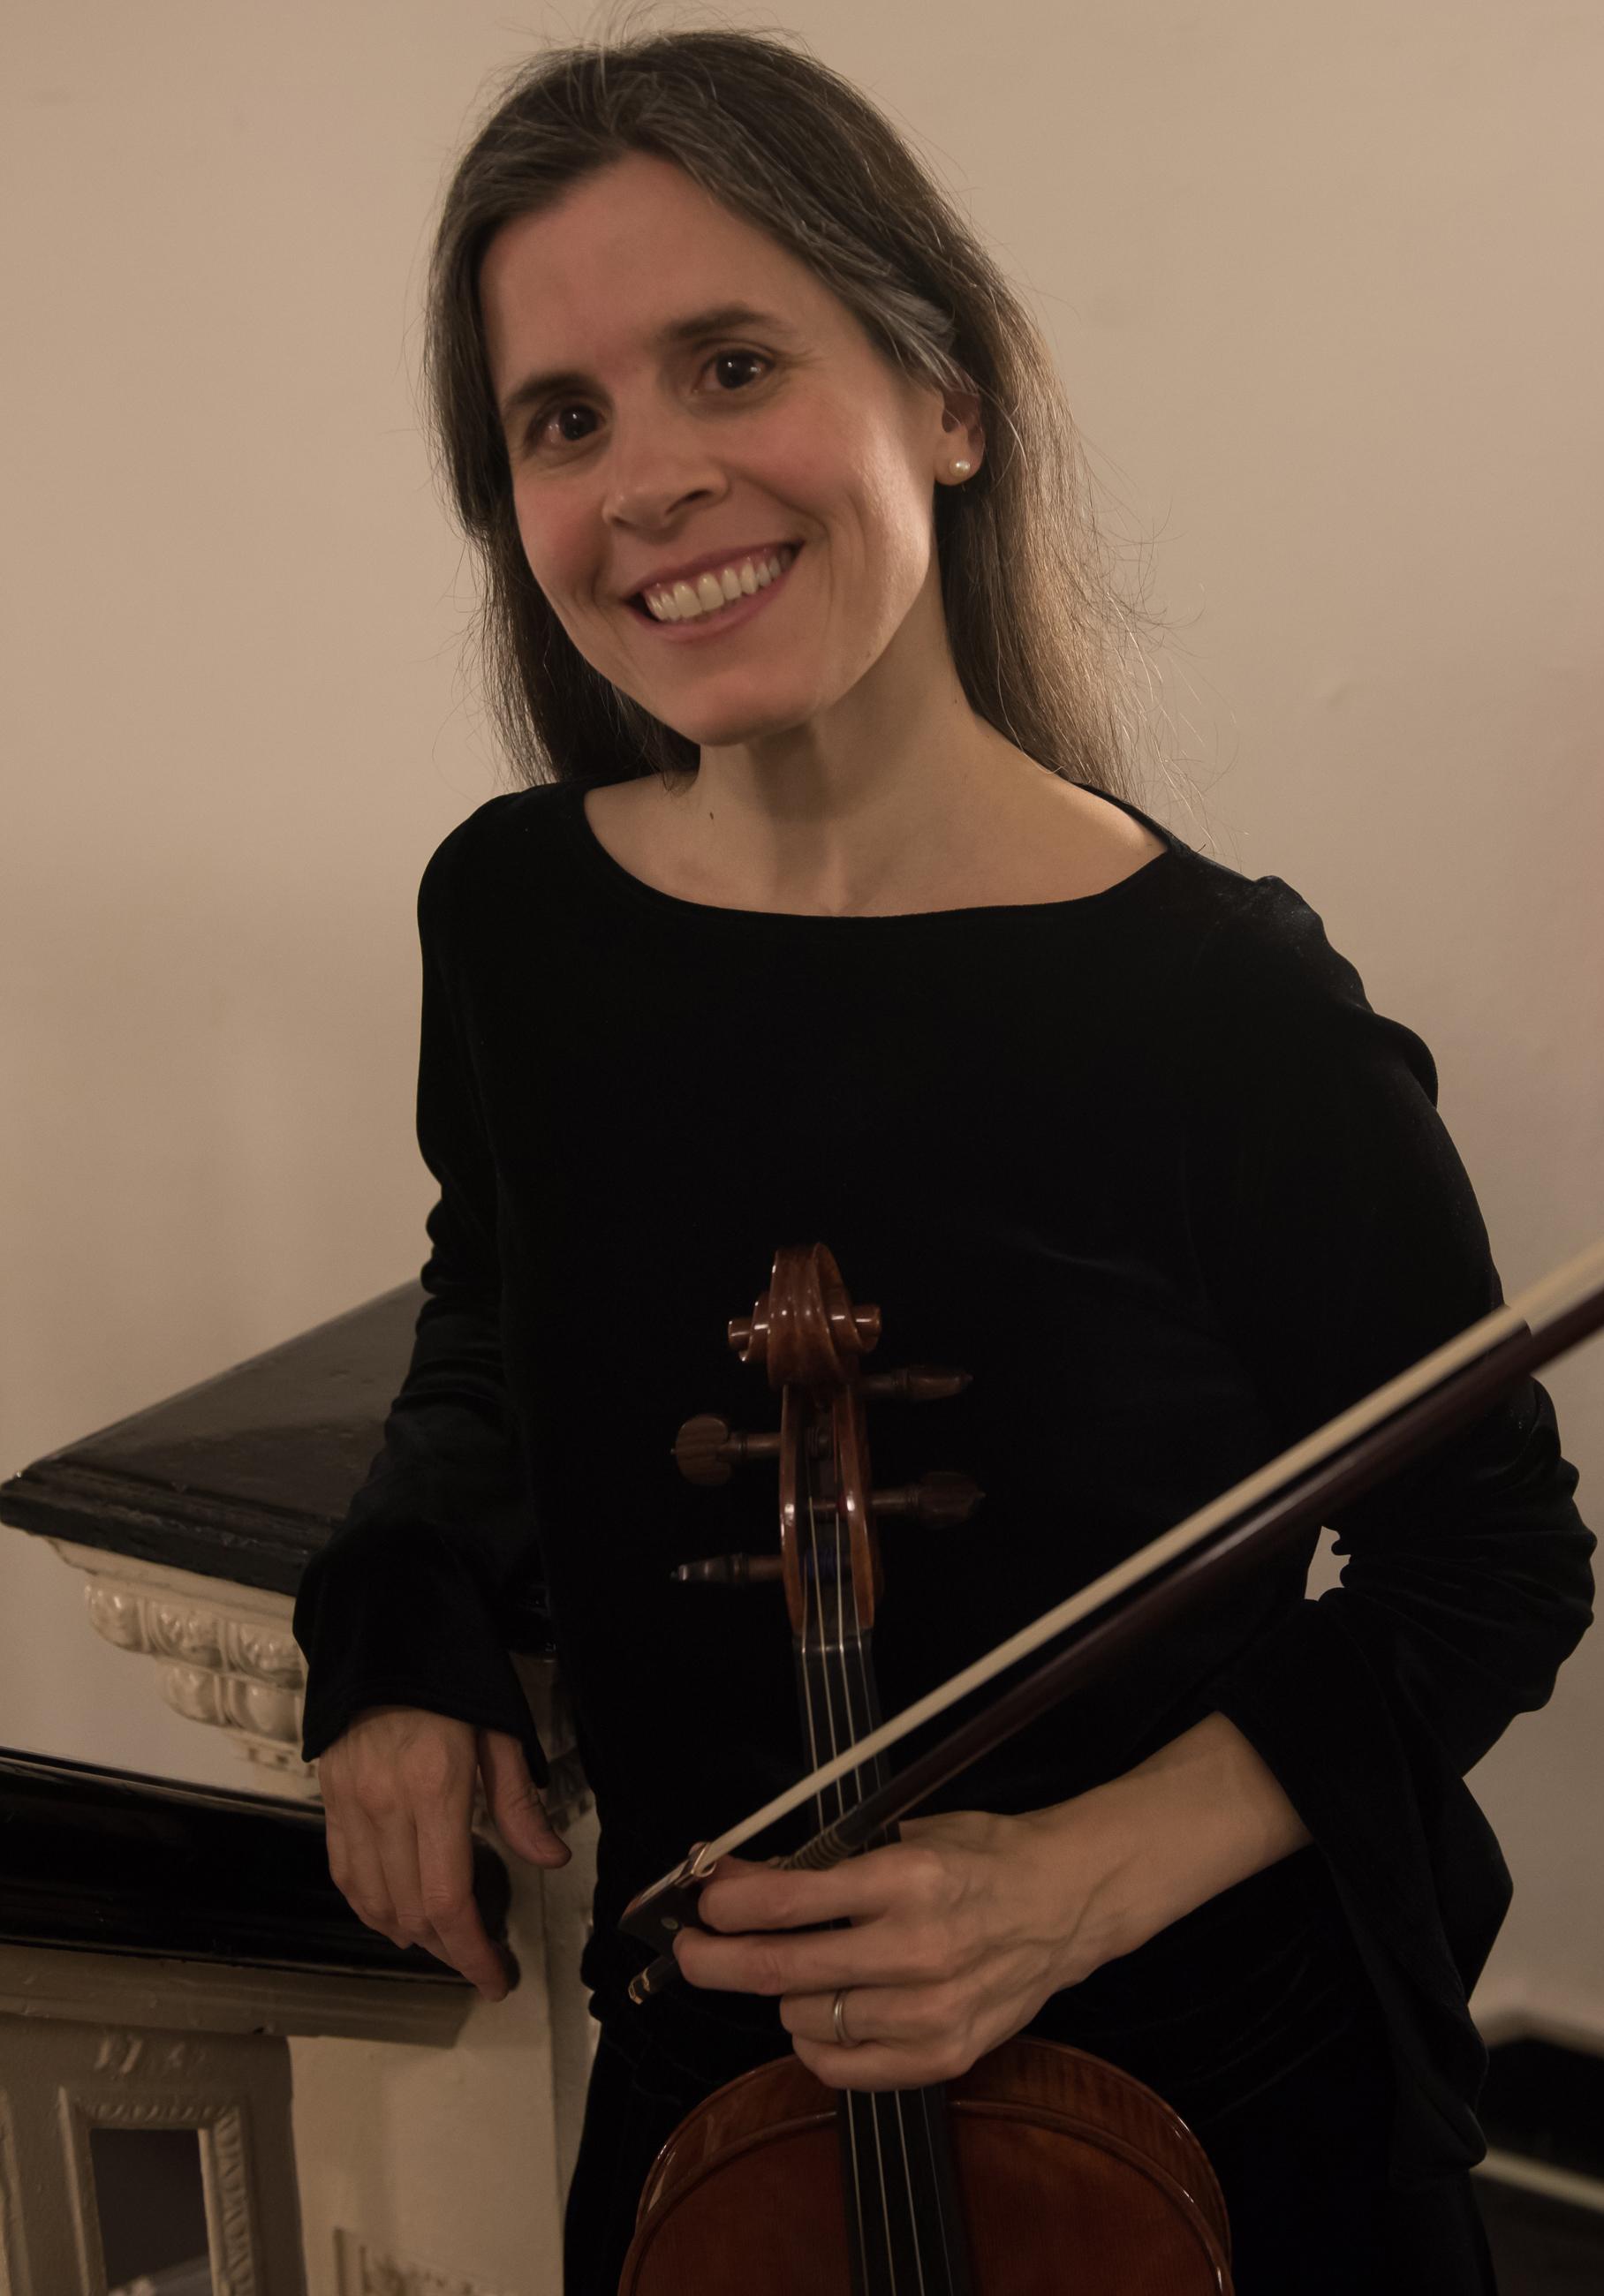 Viola, Santa Maria Pecoraro, Orchestra Manager